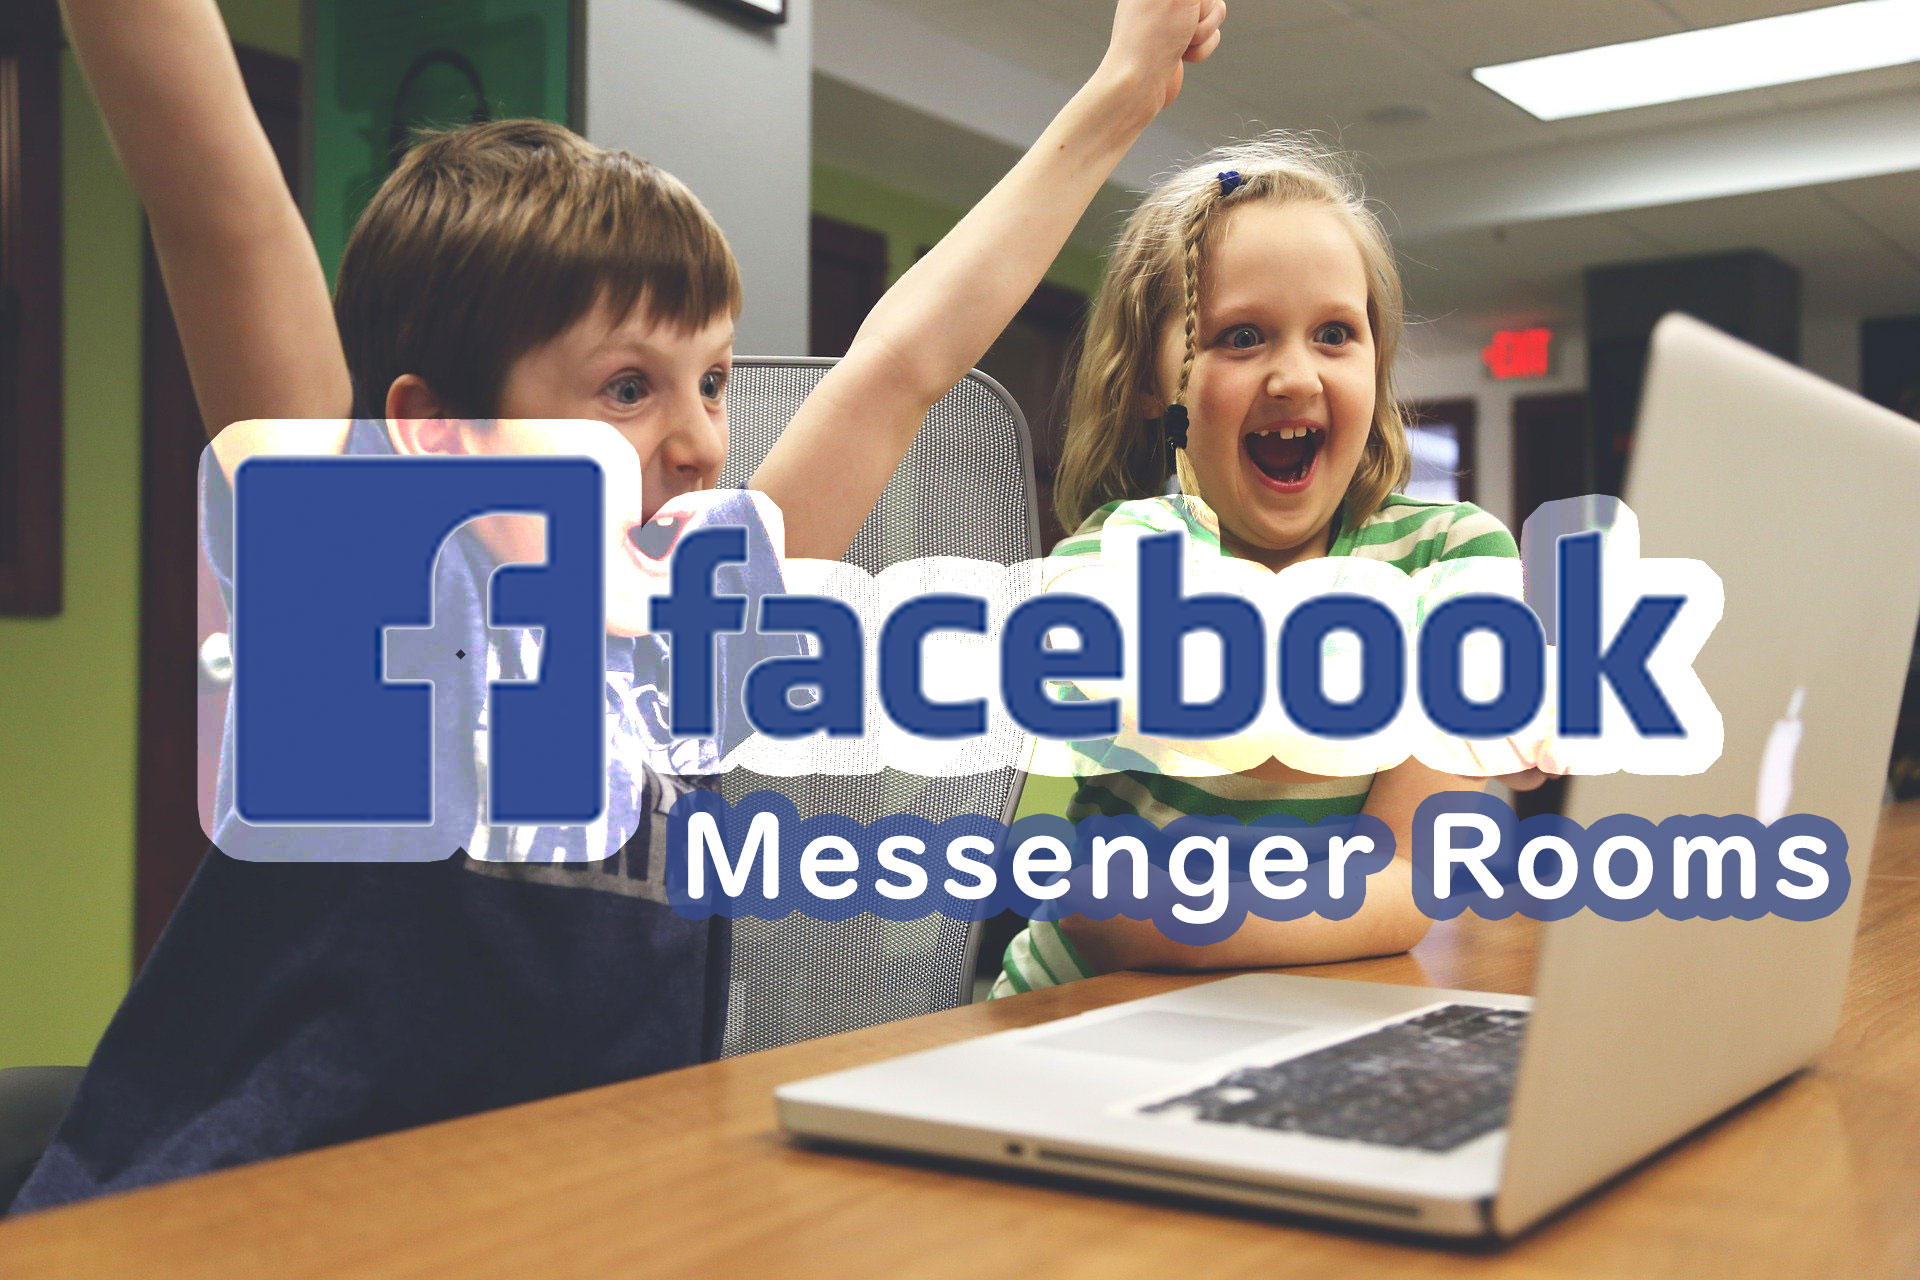 Facebook 、無料でビデオ会議機能を提供!最大50人まで参加可能